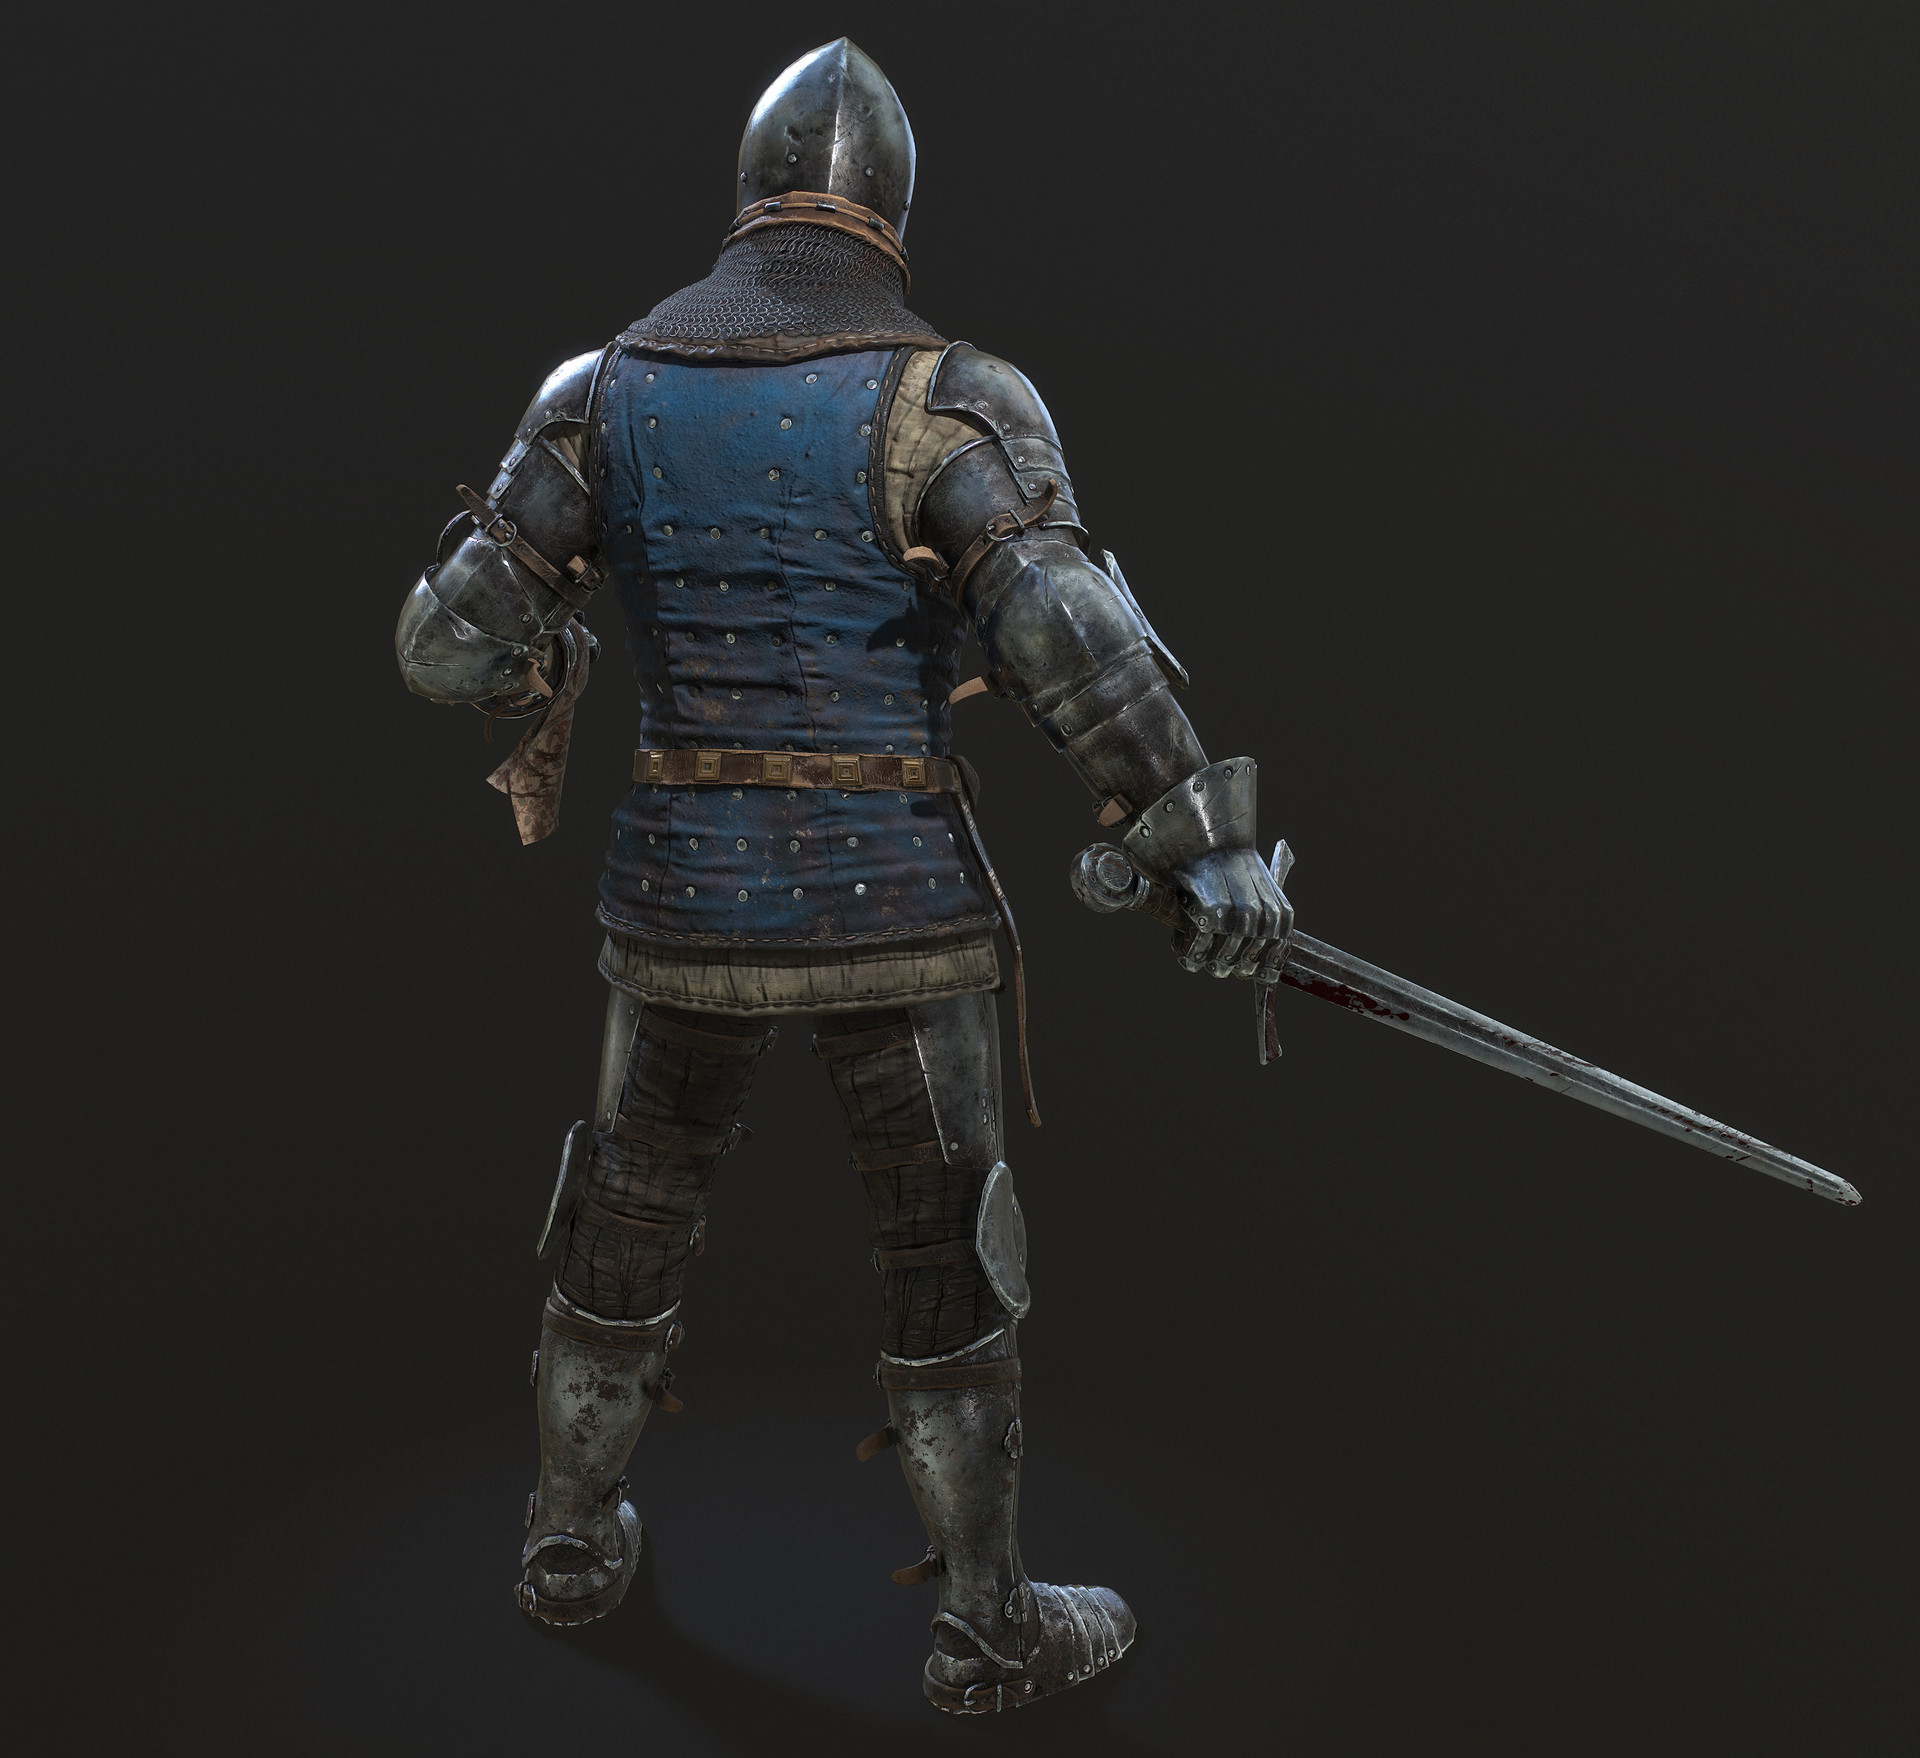 Petr sokolov artpity knight lp back